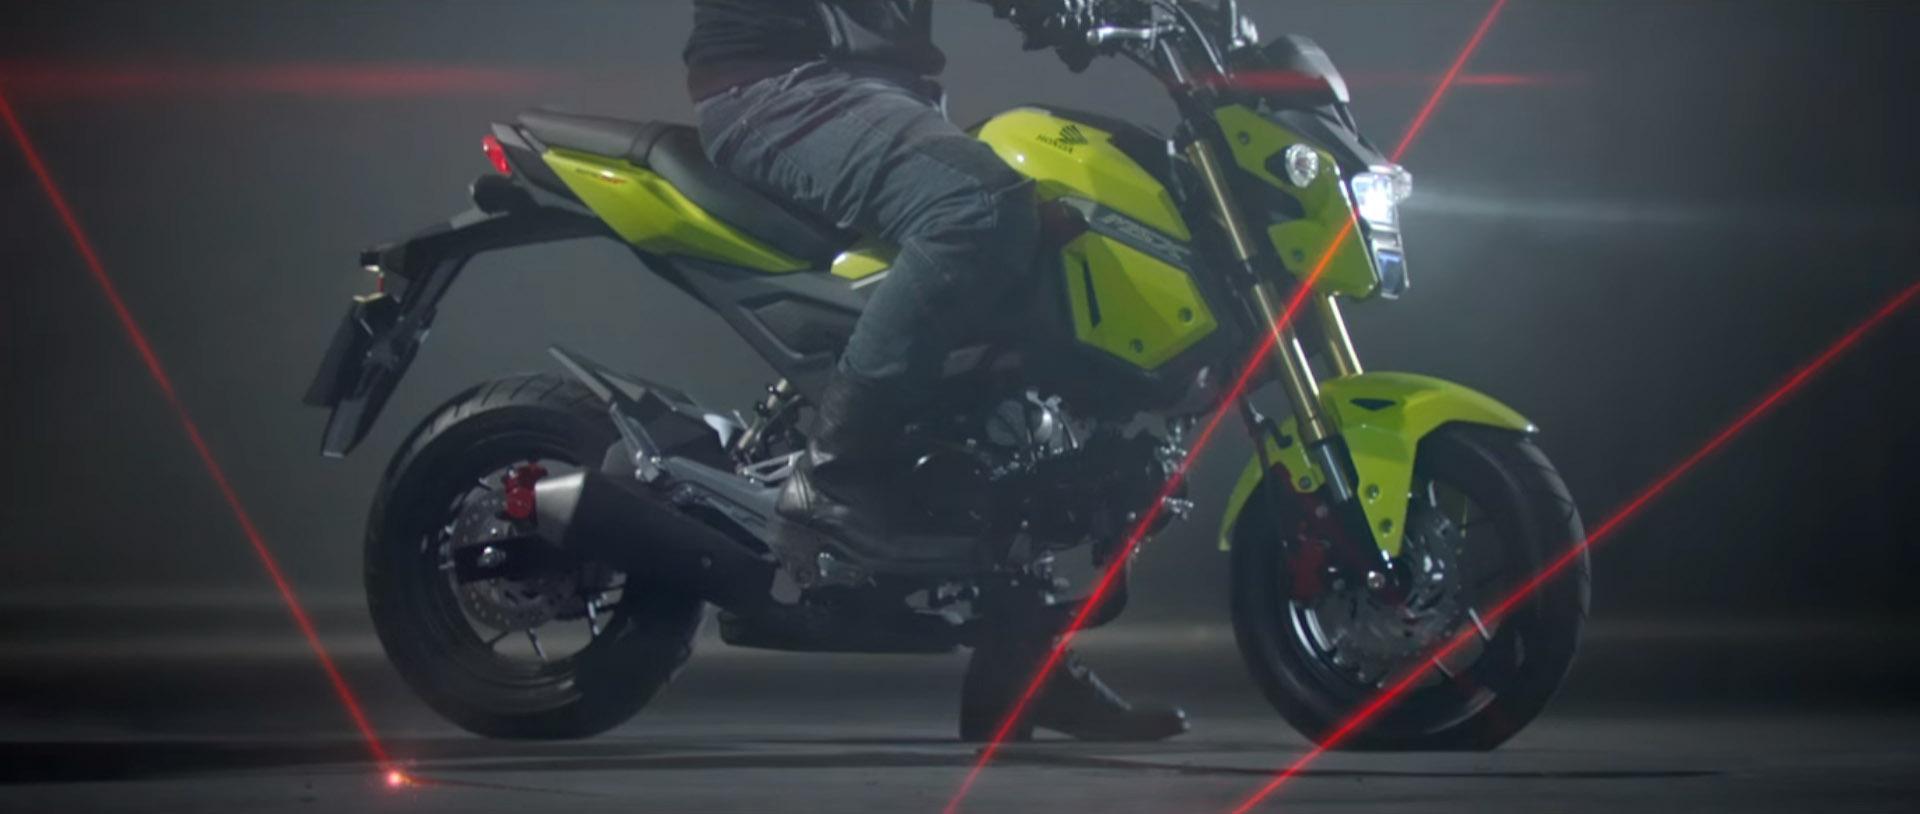 honda grom  announcement motorcycle news update